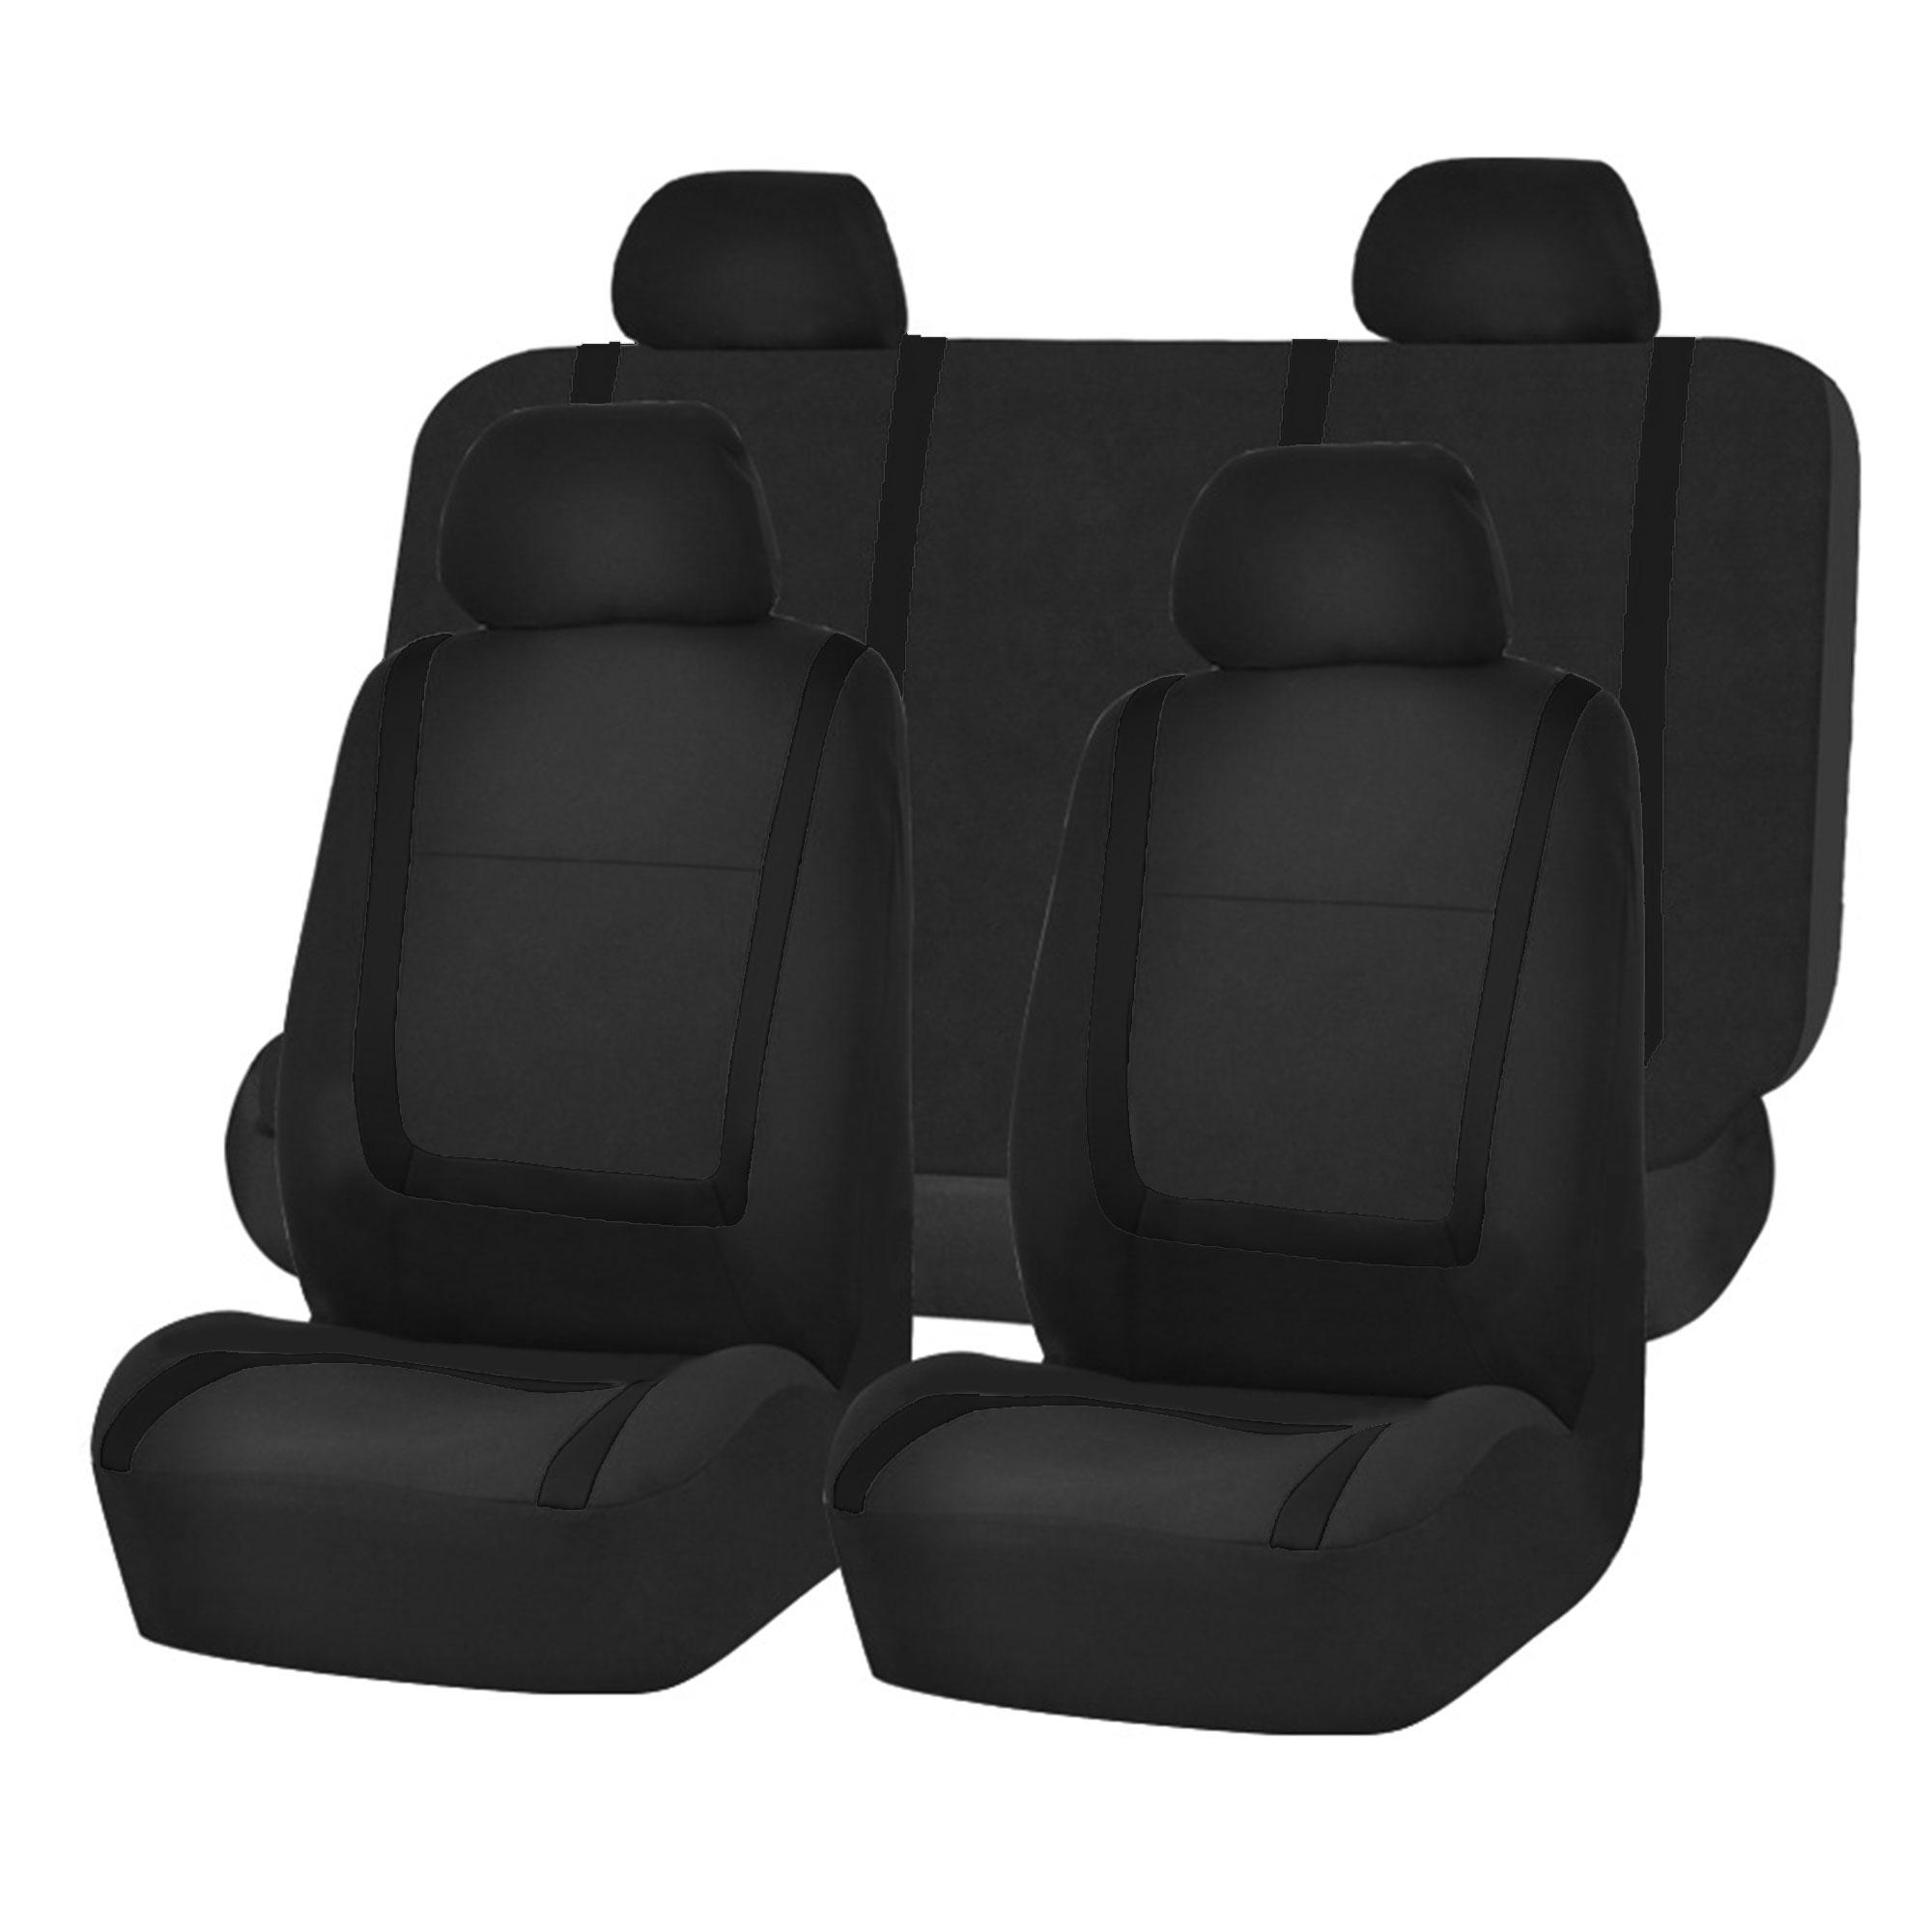 BESTFH | Rakuten: Car Seat Covers Solid Black Combo Set For Auto w ...